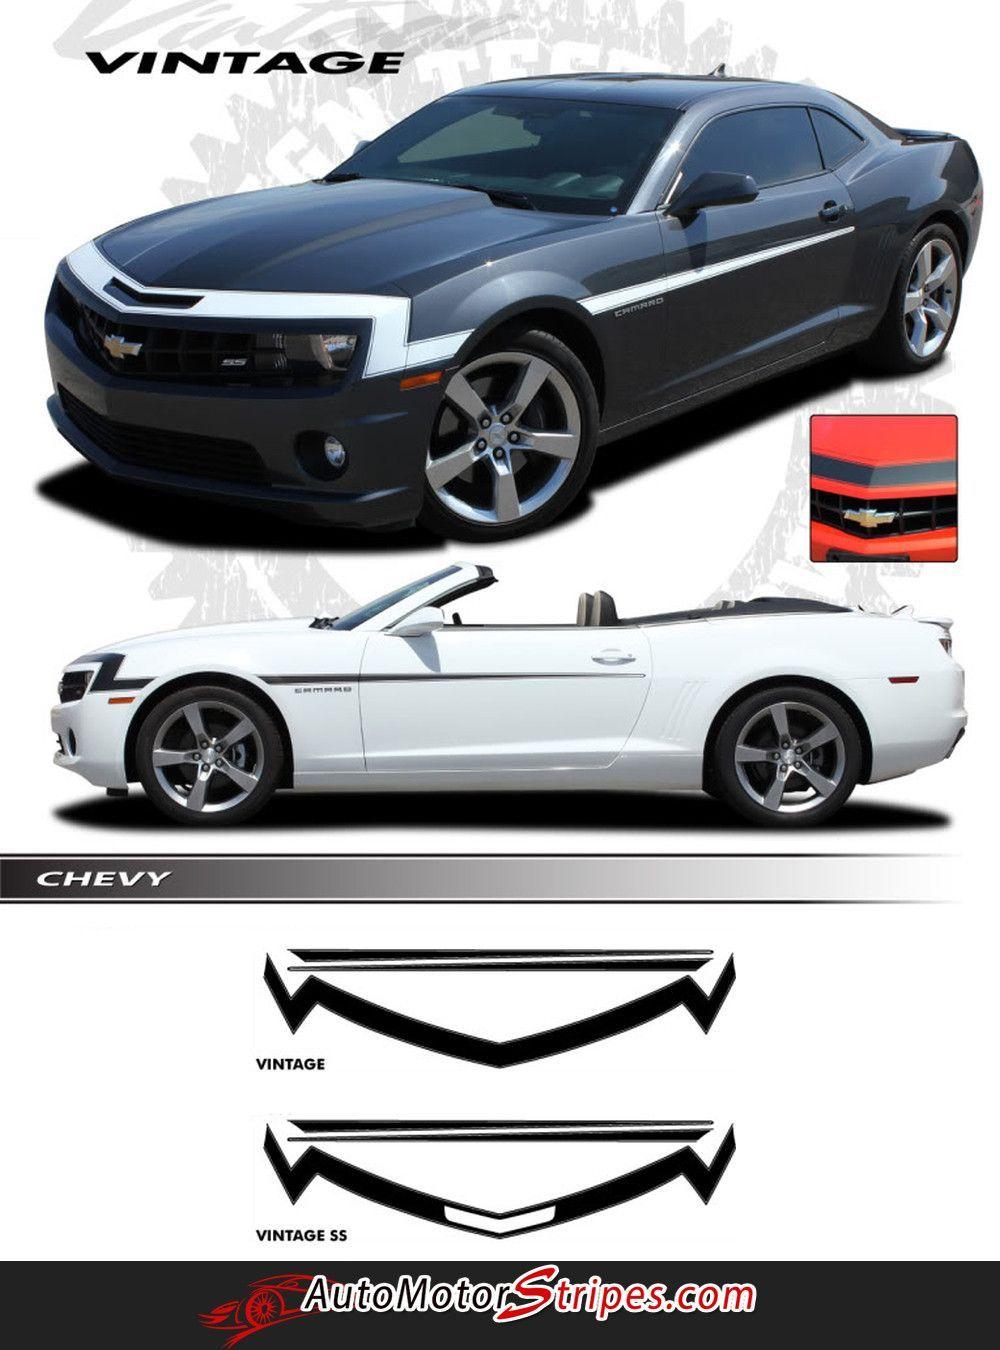 "Vehicle Specific Style Chevy Camaro ""VINTAGE"" Retro Style"